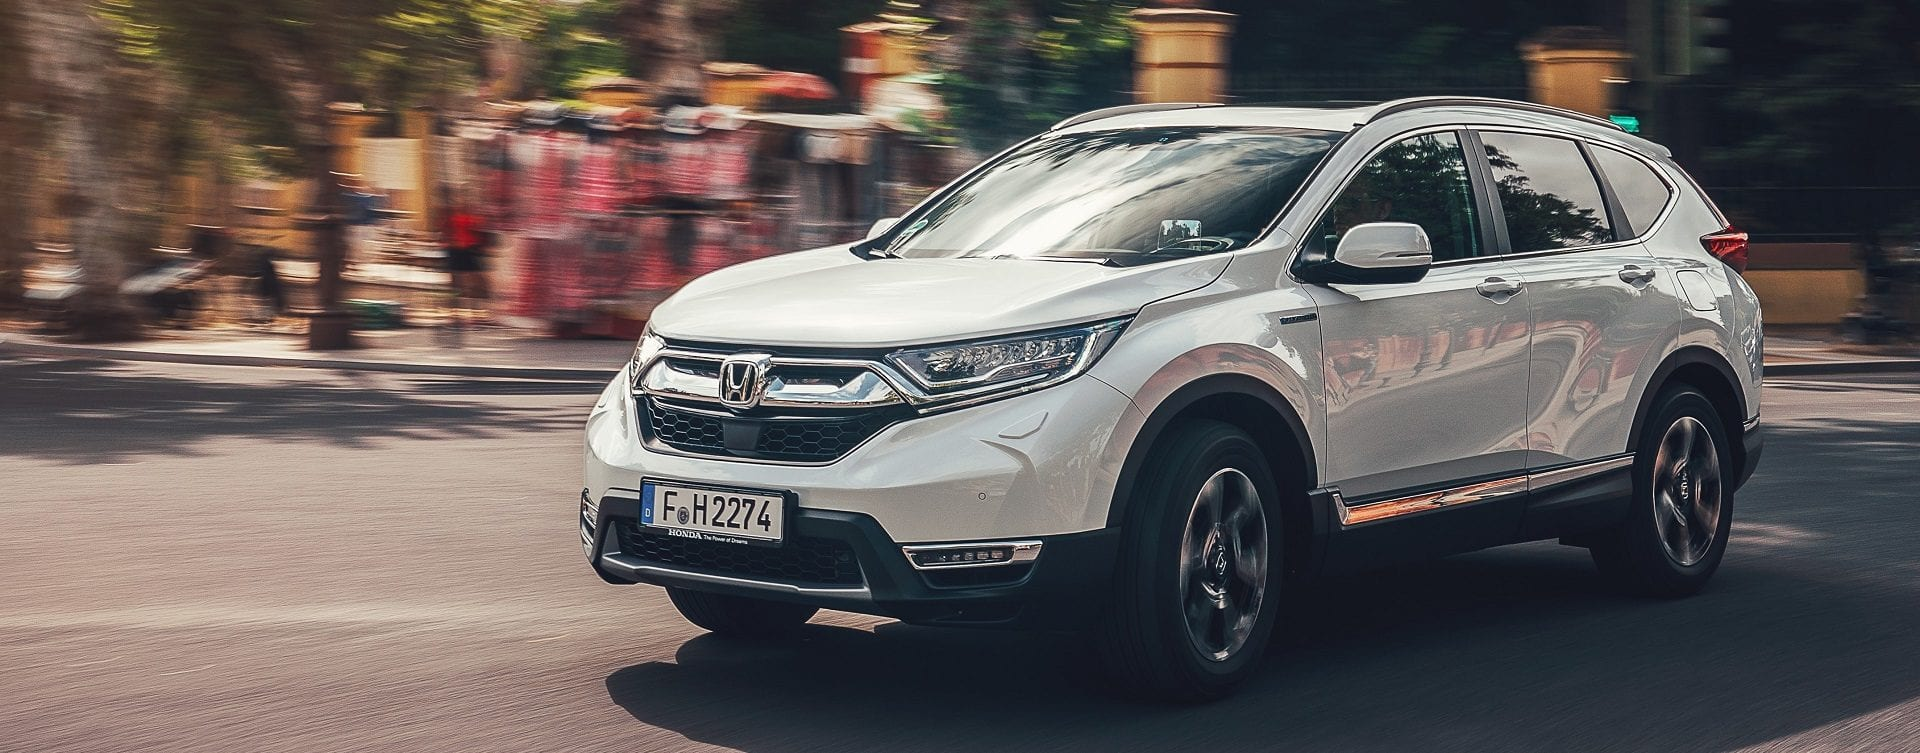 De Honda CR-V 2019